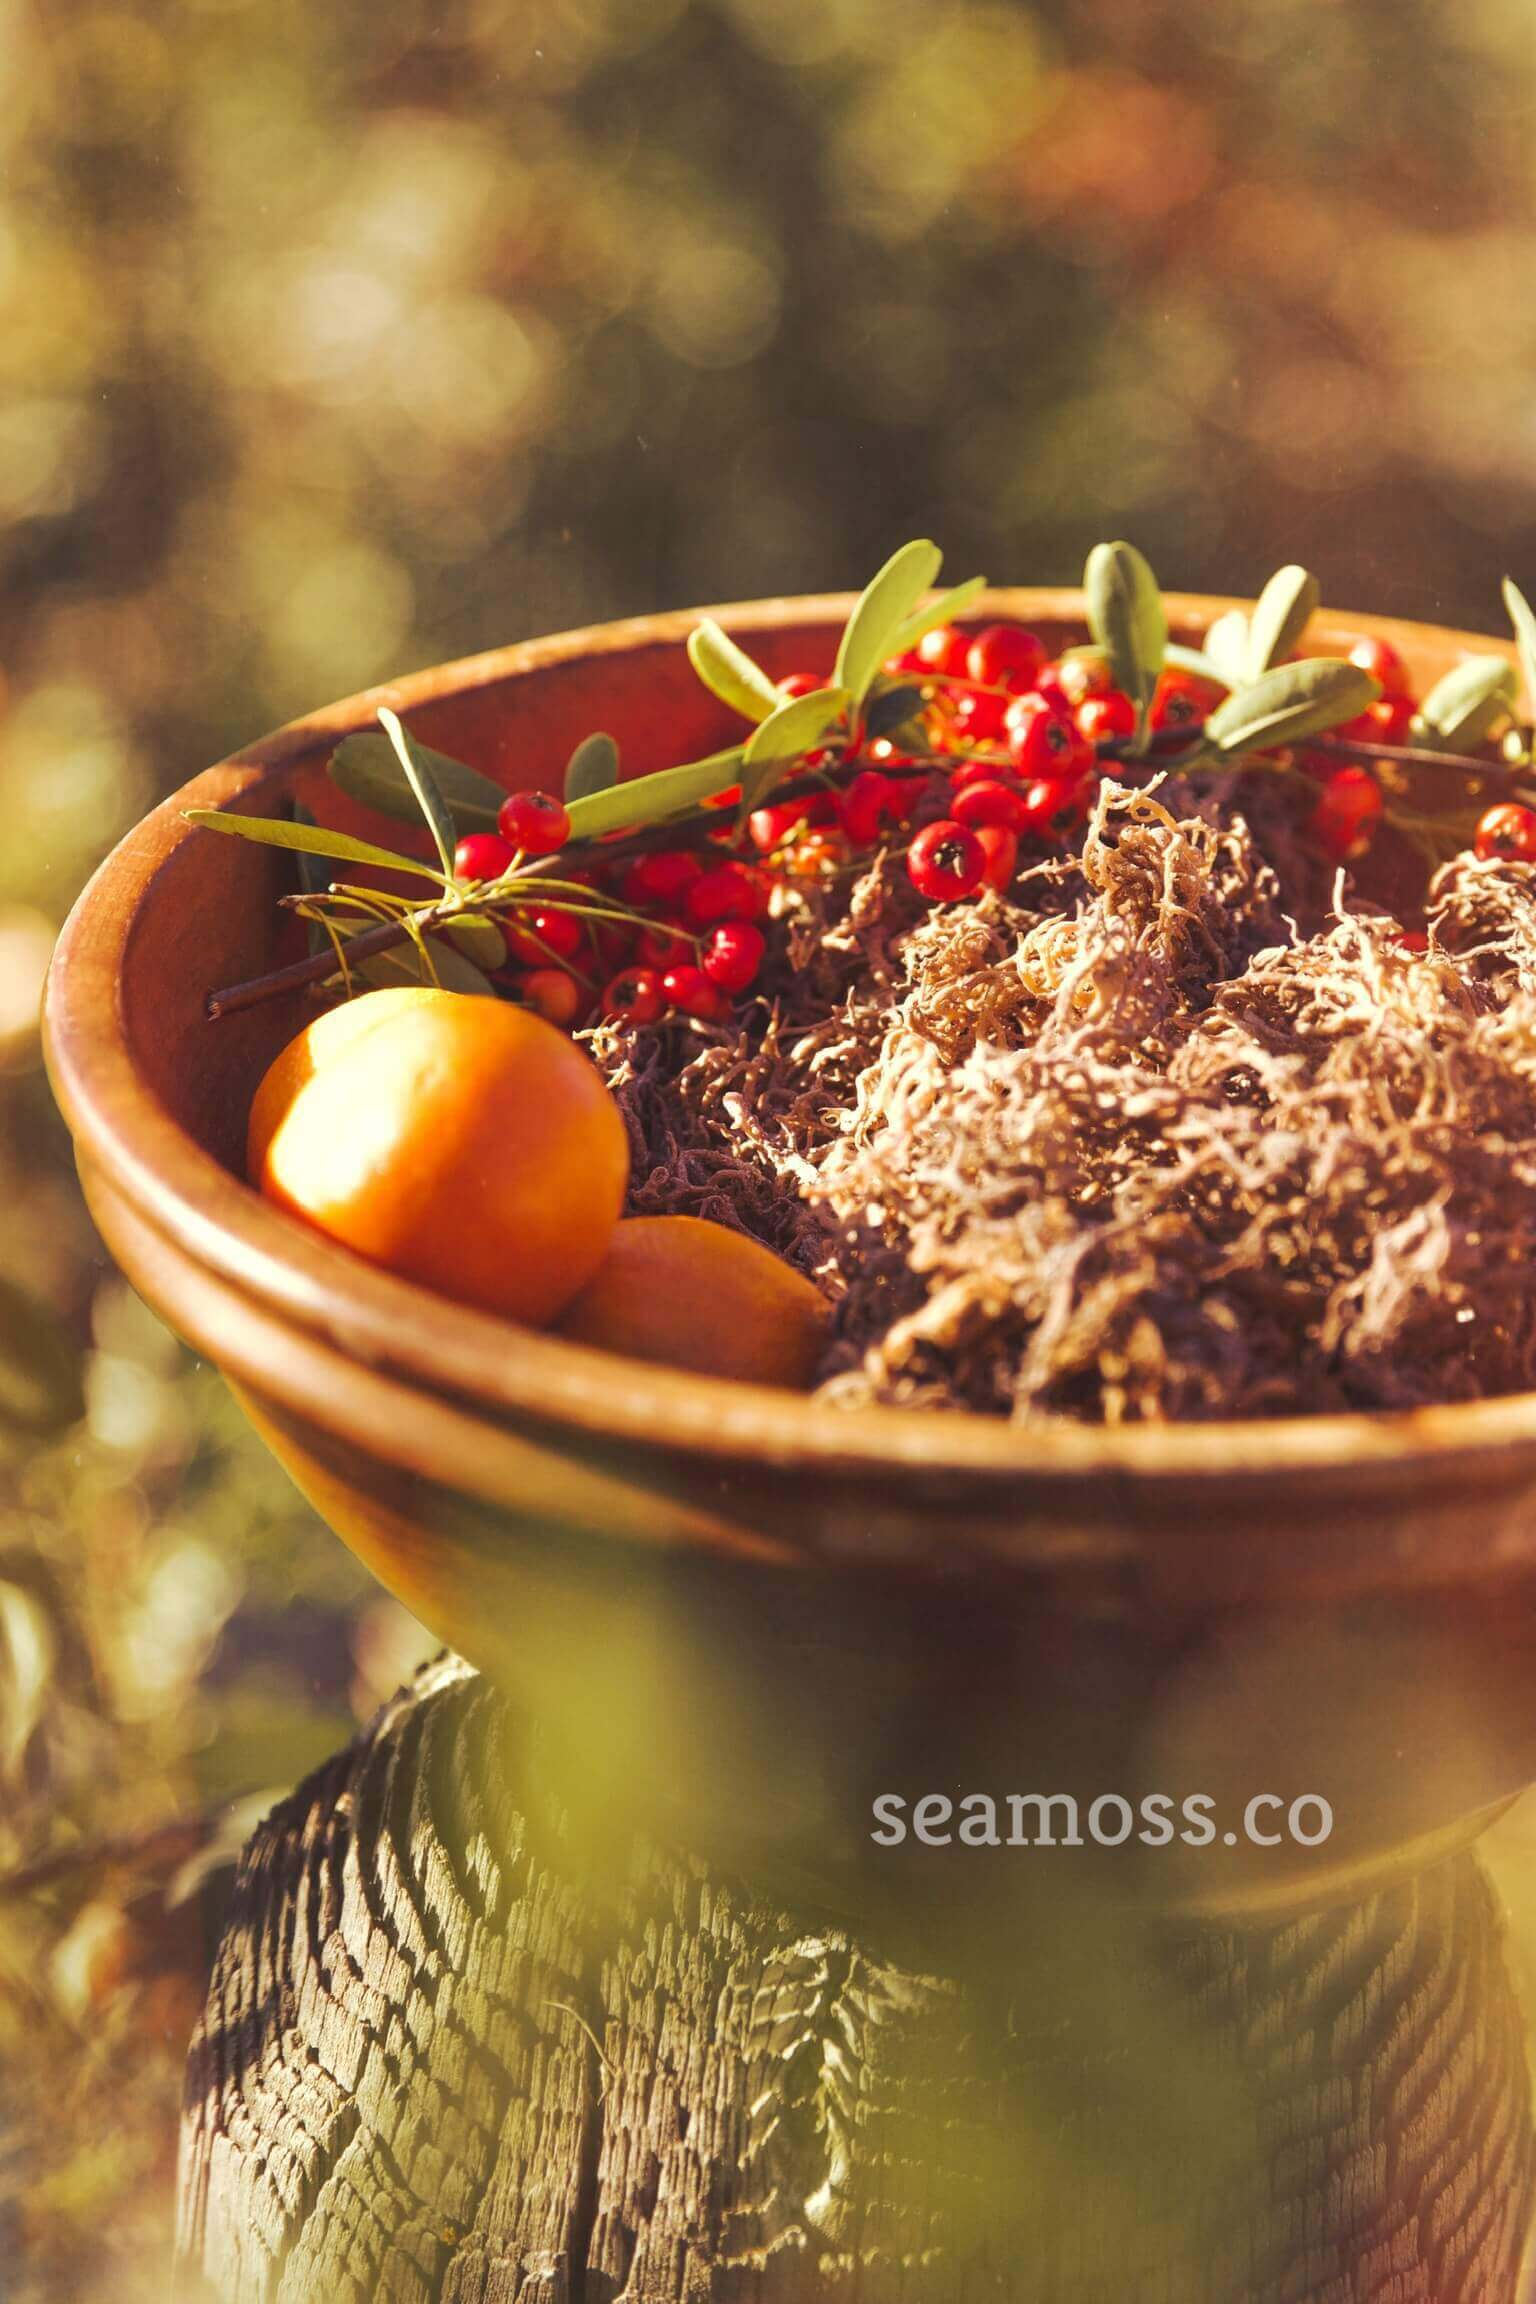 Beautiful Bowl with sea Moss